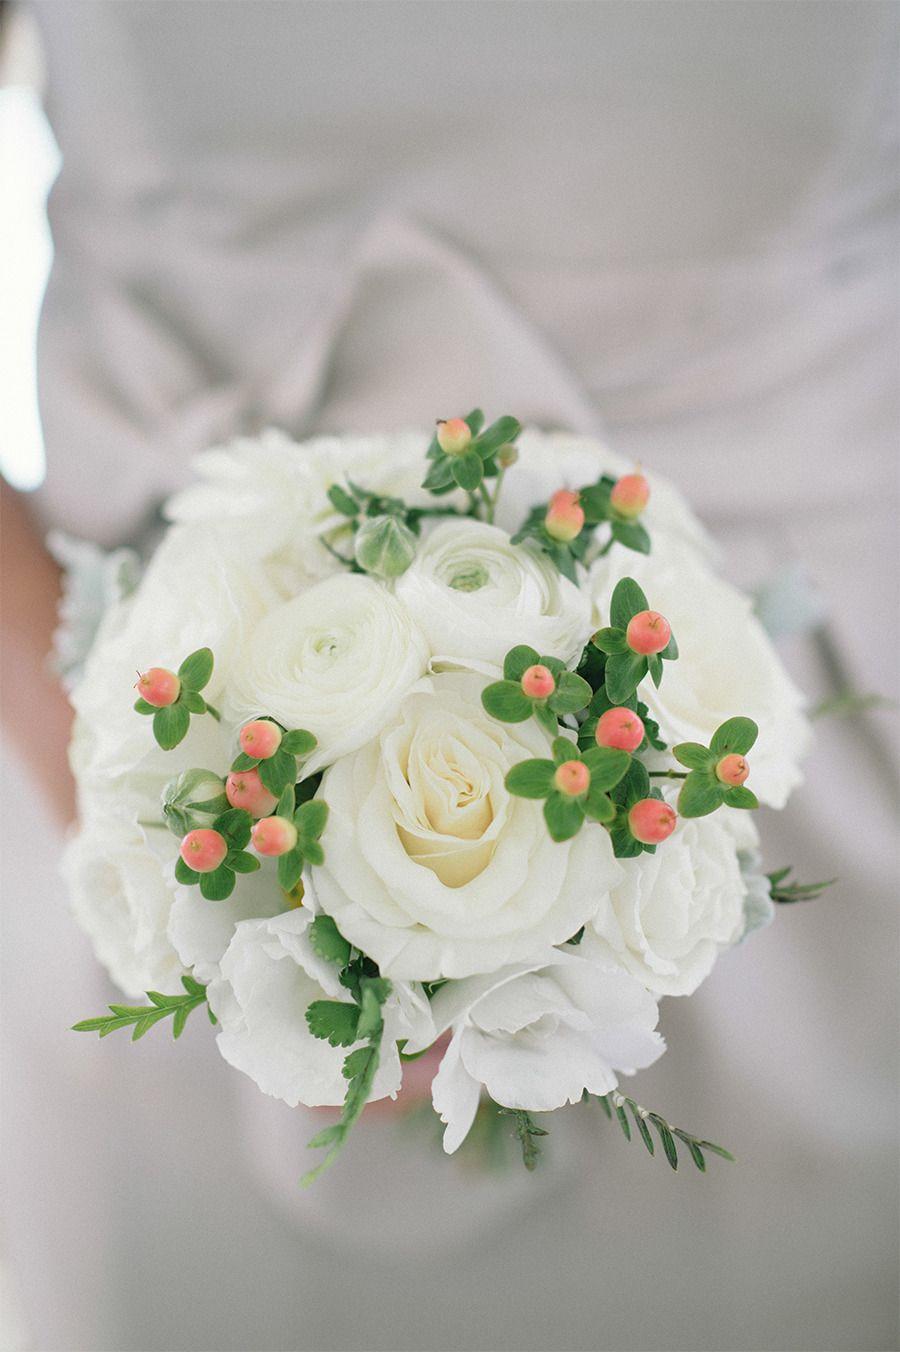 Elegant Newport Estate Wedding  Read more - http://www.stylemepretty.com/2014/02/04/elegant-newport-estate-wedding/